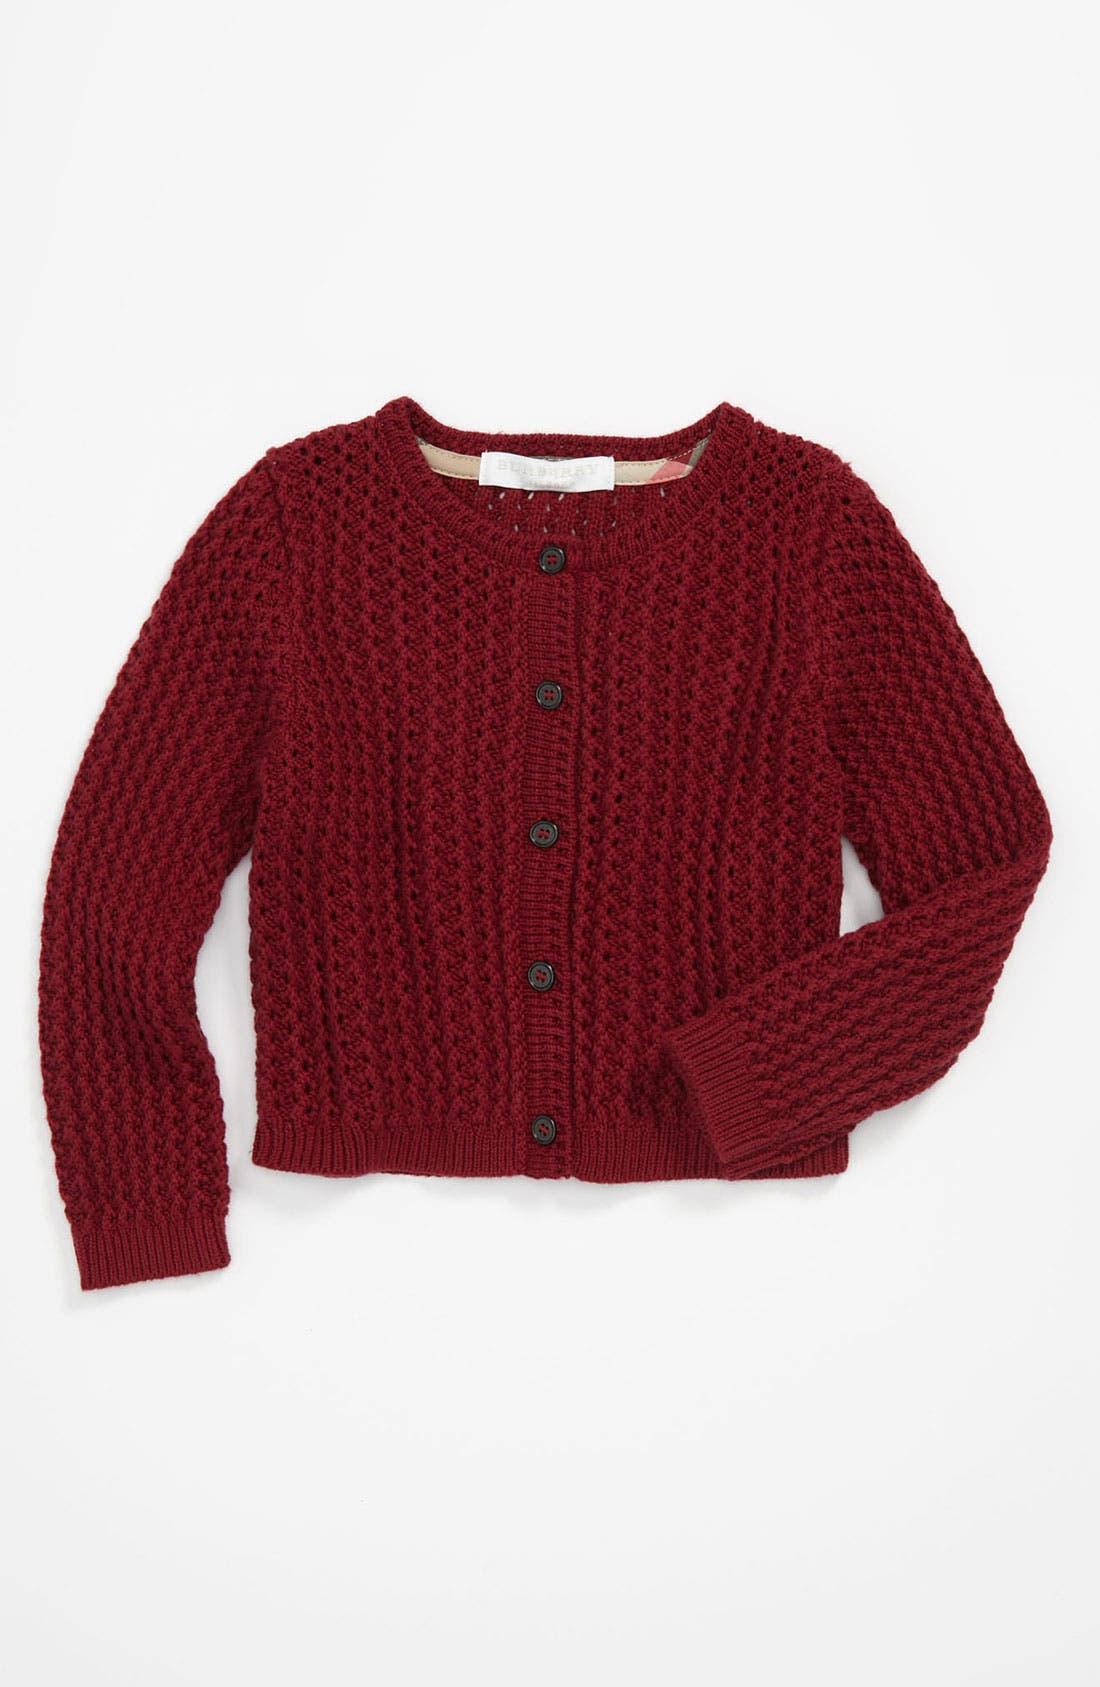 Main Image - Burberry 'Mini Tobalt' Cardigan (Baby)